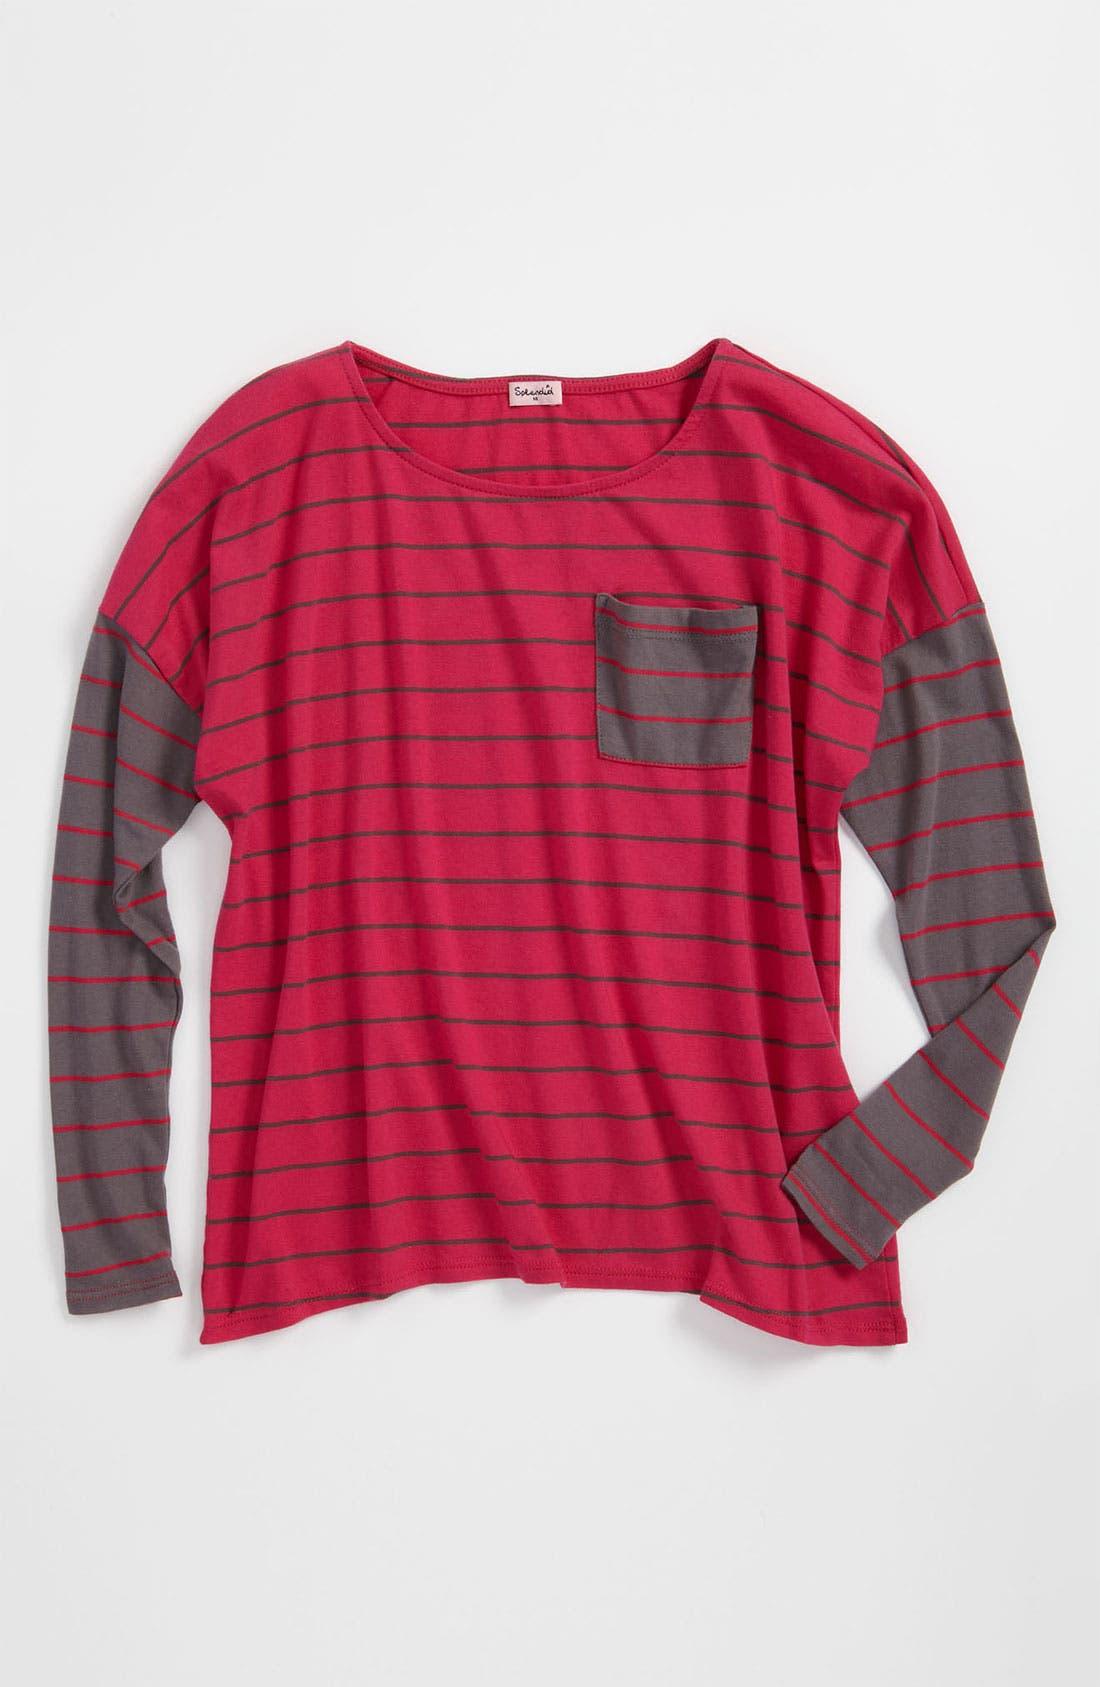 Alternate Image 1 Selected - Splendid 'Lacrosse' Stripe Top (Big Girls)